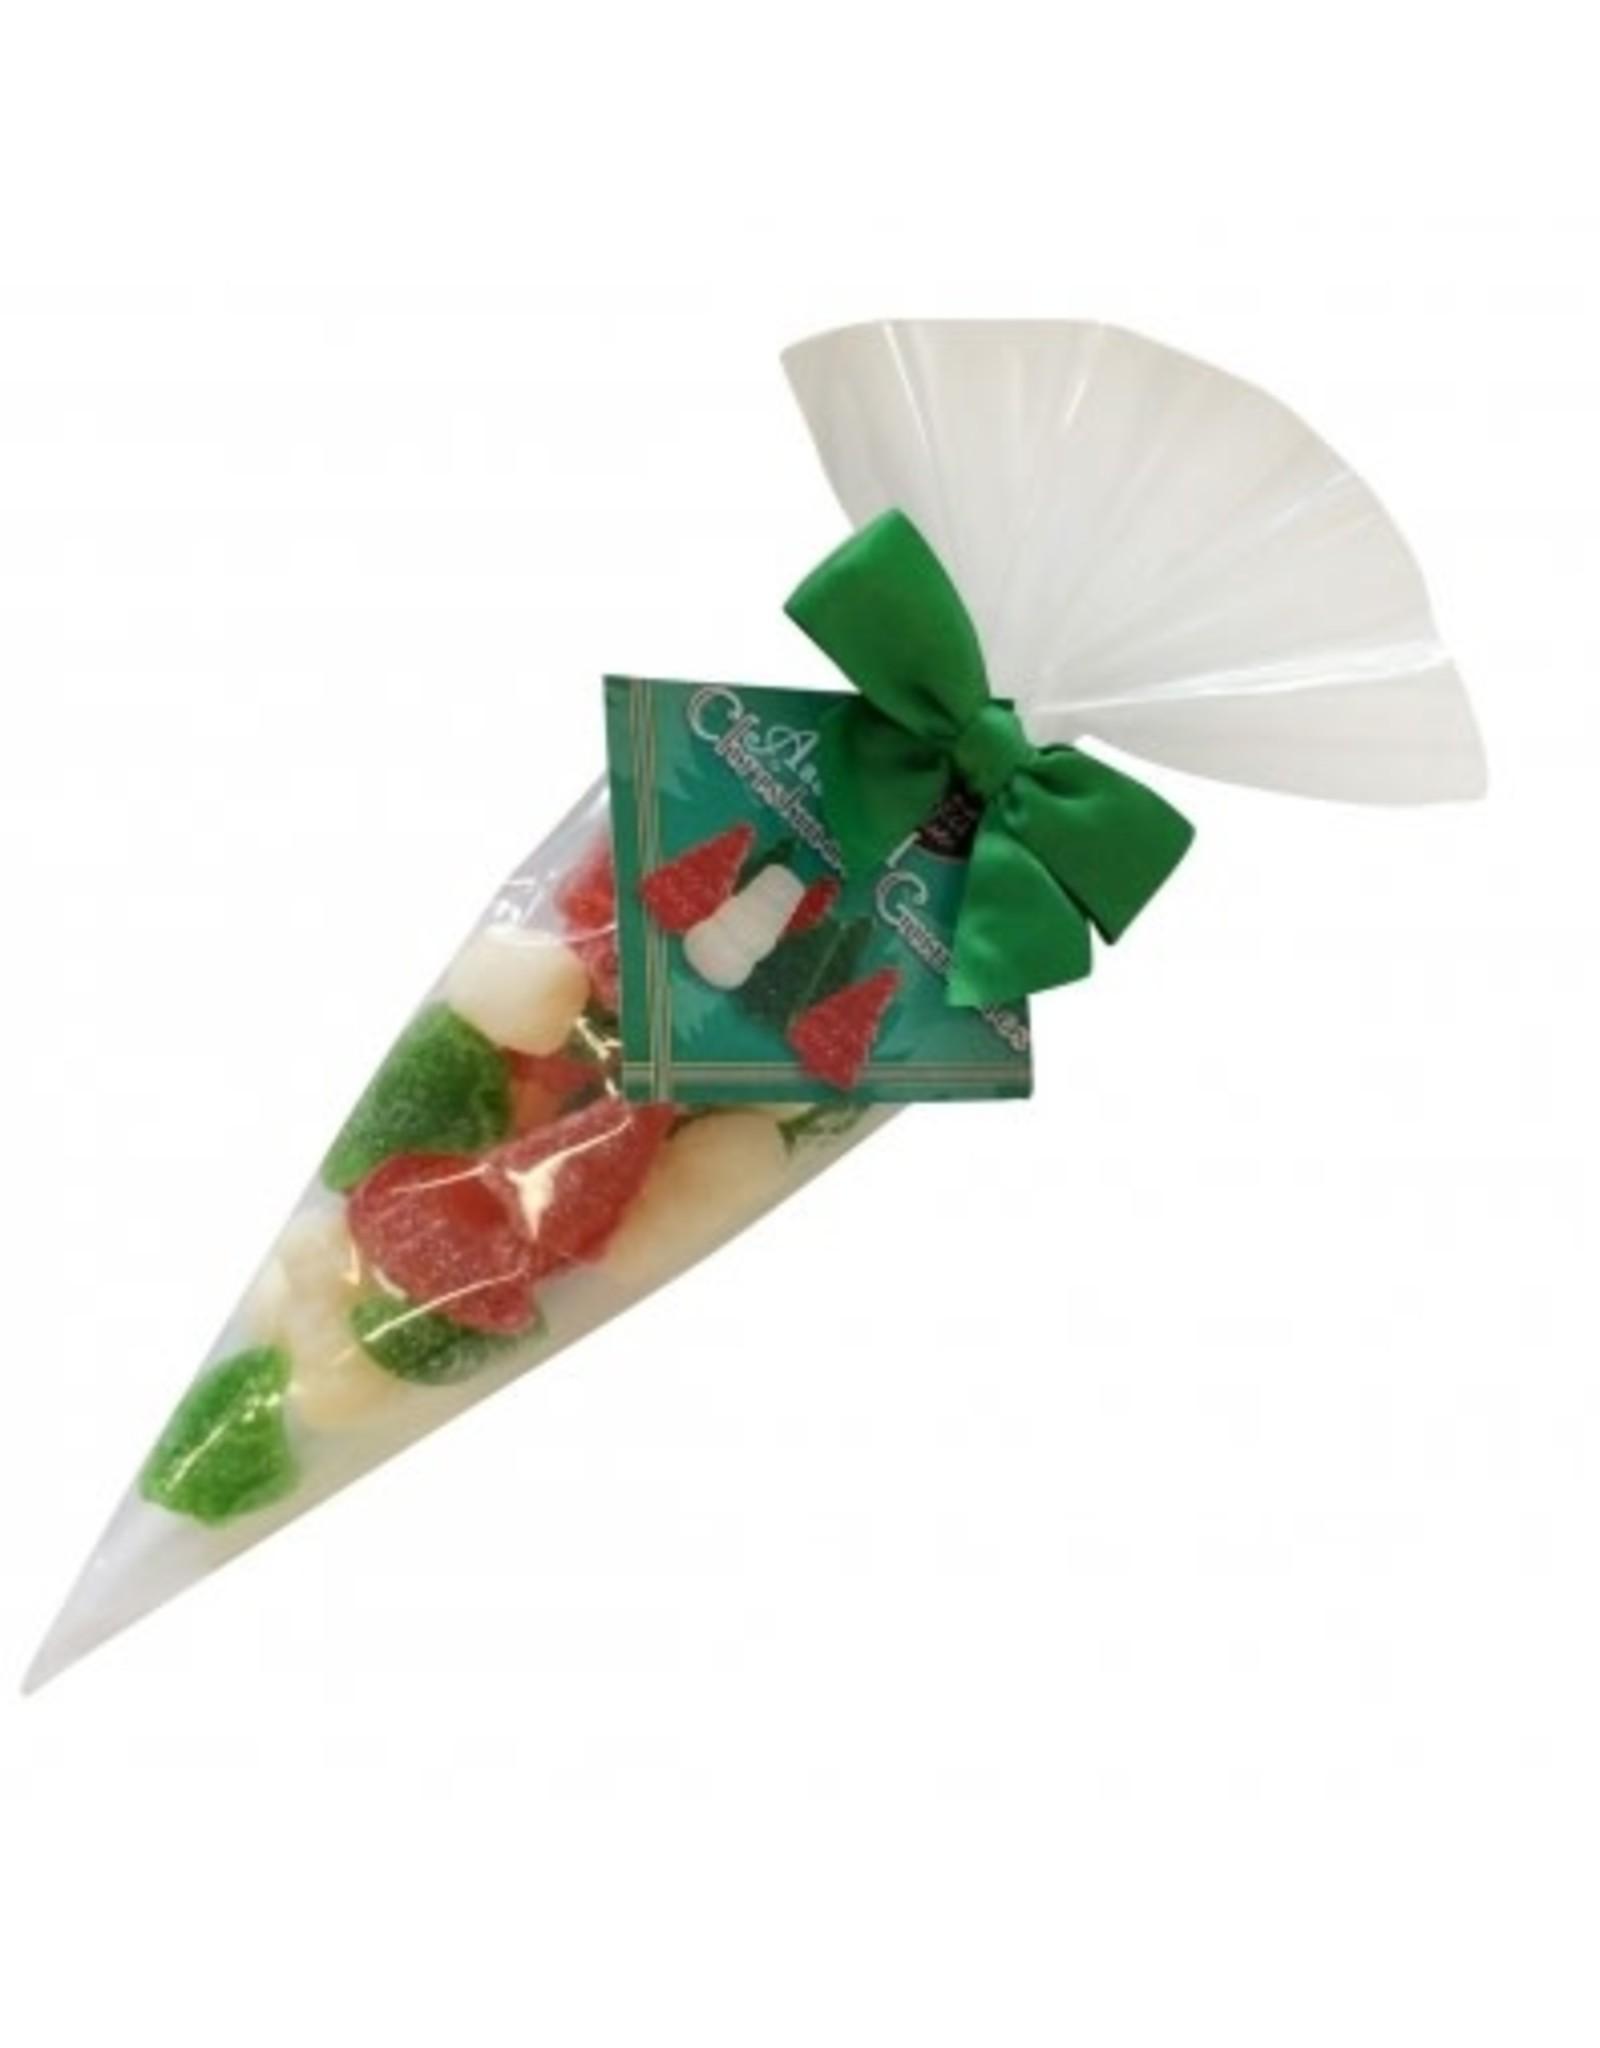 anDea Chocolates Christmas Gummy Cone Bag